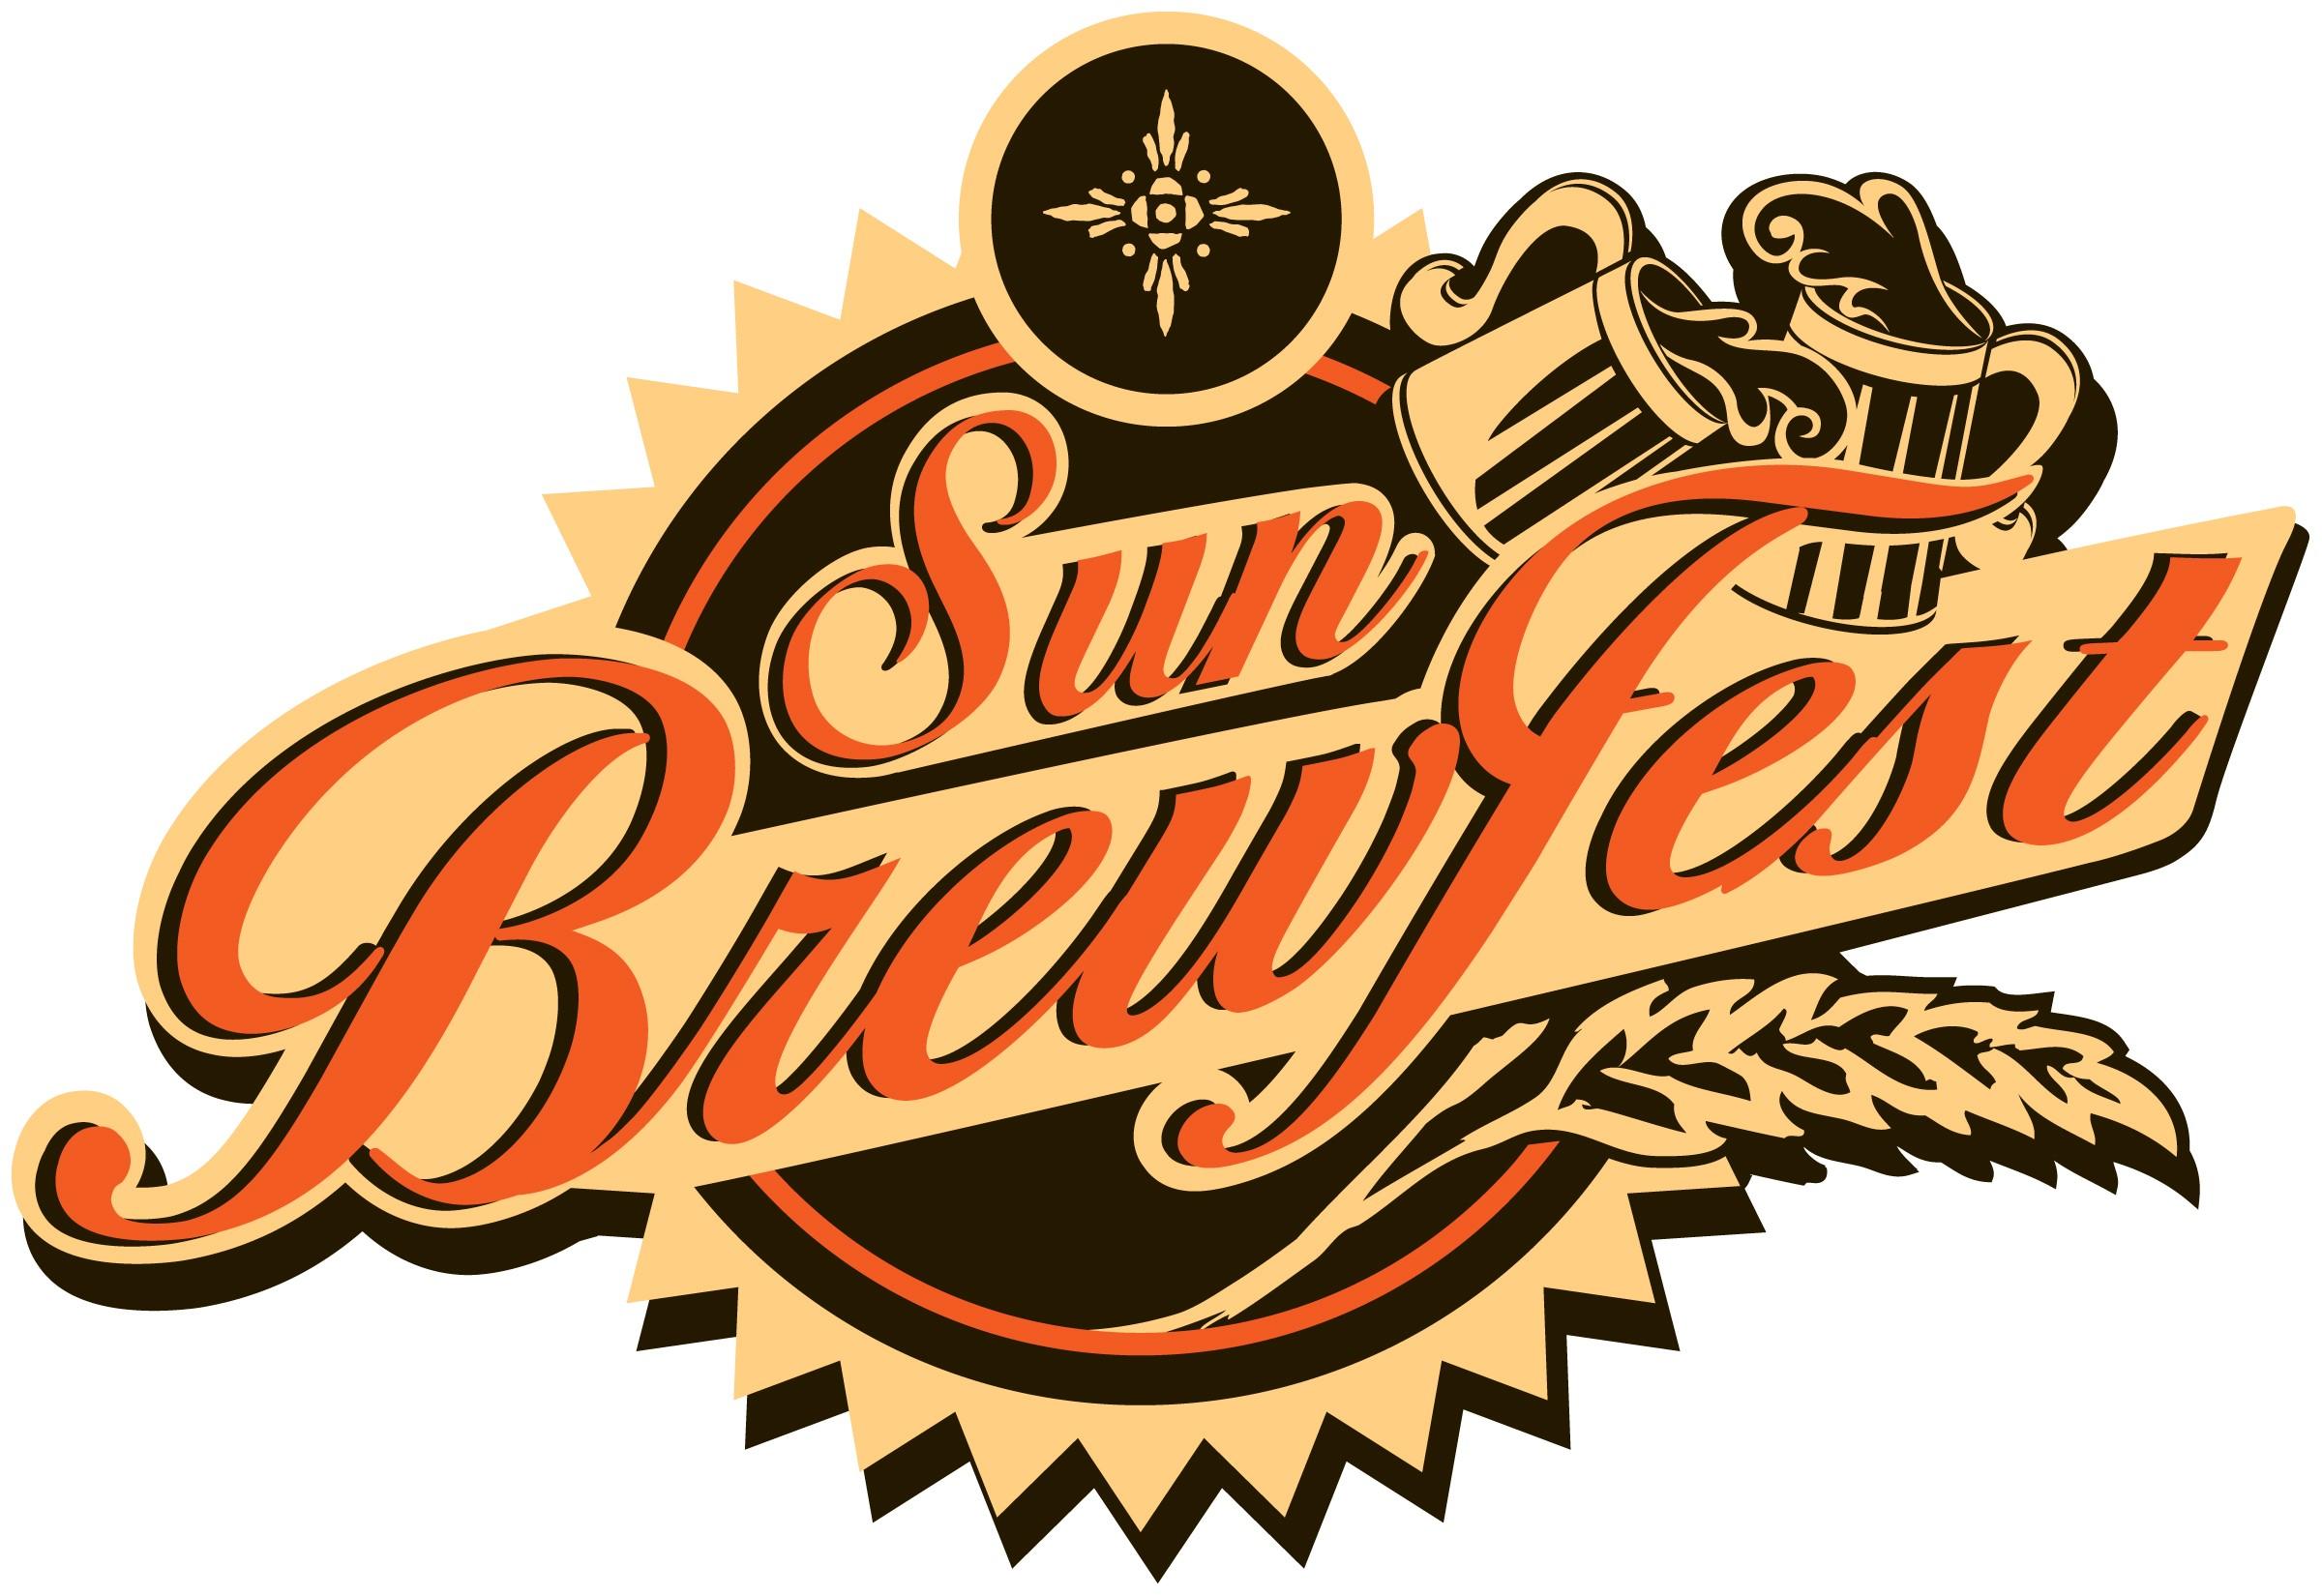 October 4 & 5, 2019: Sun Brewfest